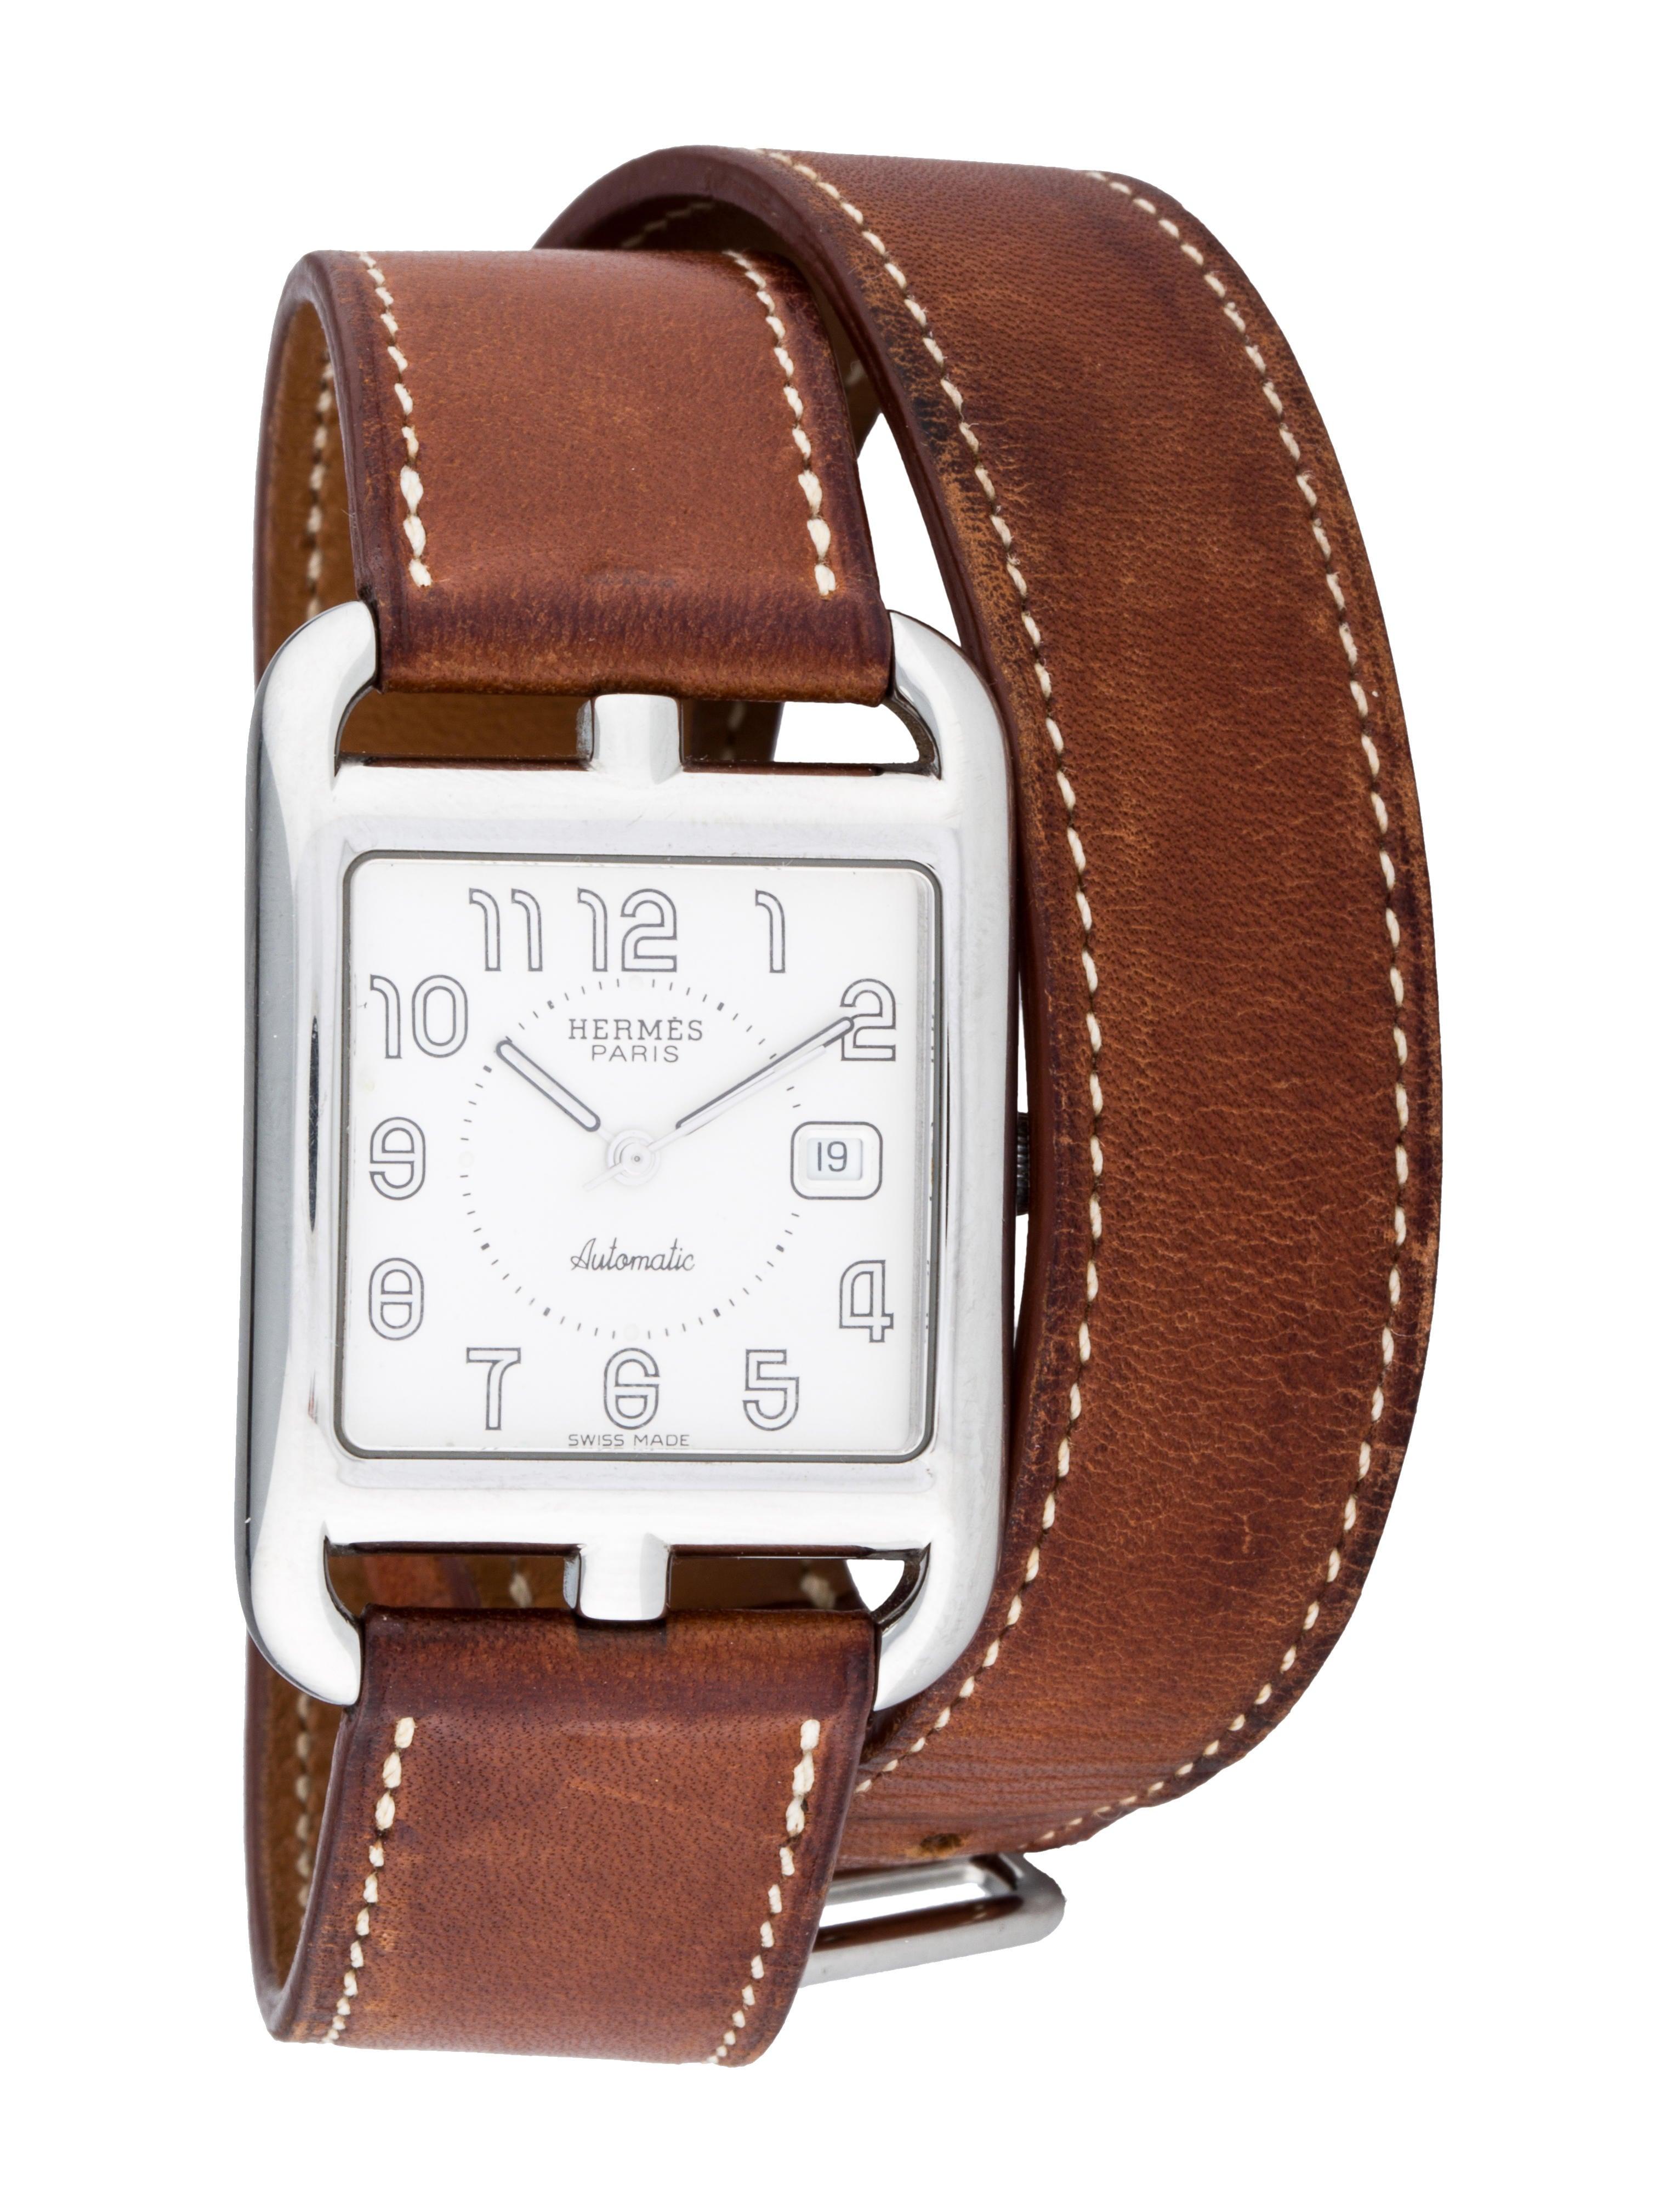 birkin 25 price - Herm��s Cape Cod Double Tour Watch - Fine Watches - HER37987 | The ...